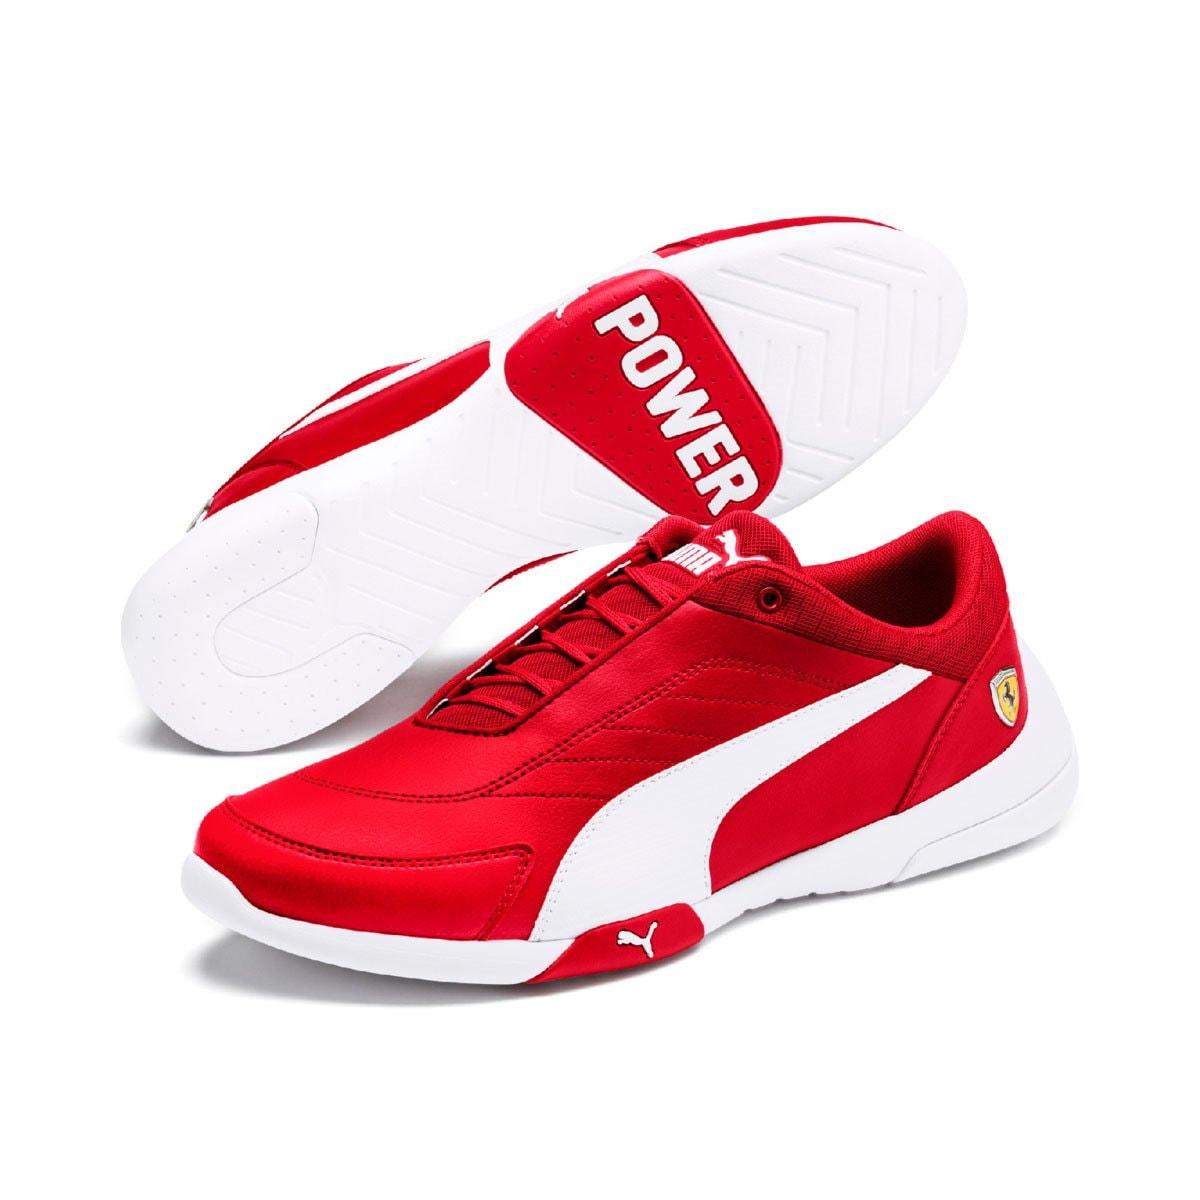 Tenis Rojo para Caballero Puma Ferrari Kart Cat Iii